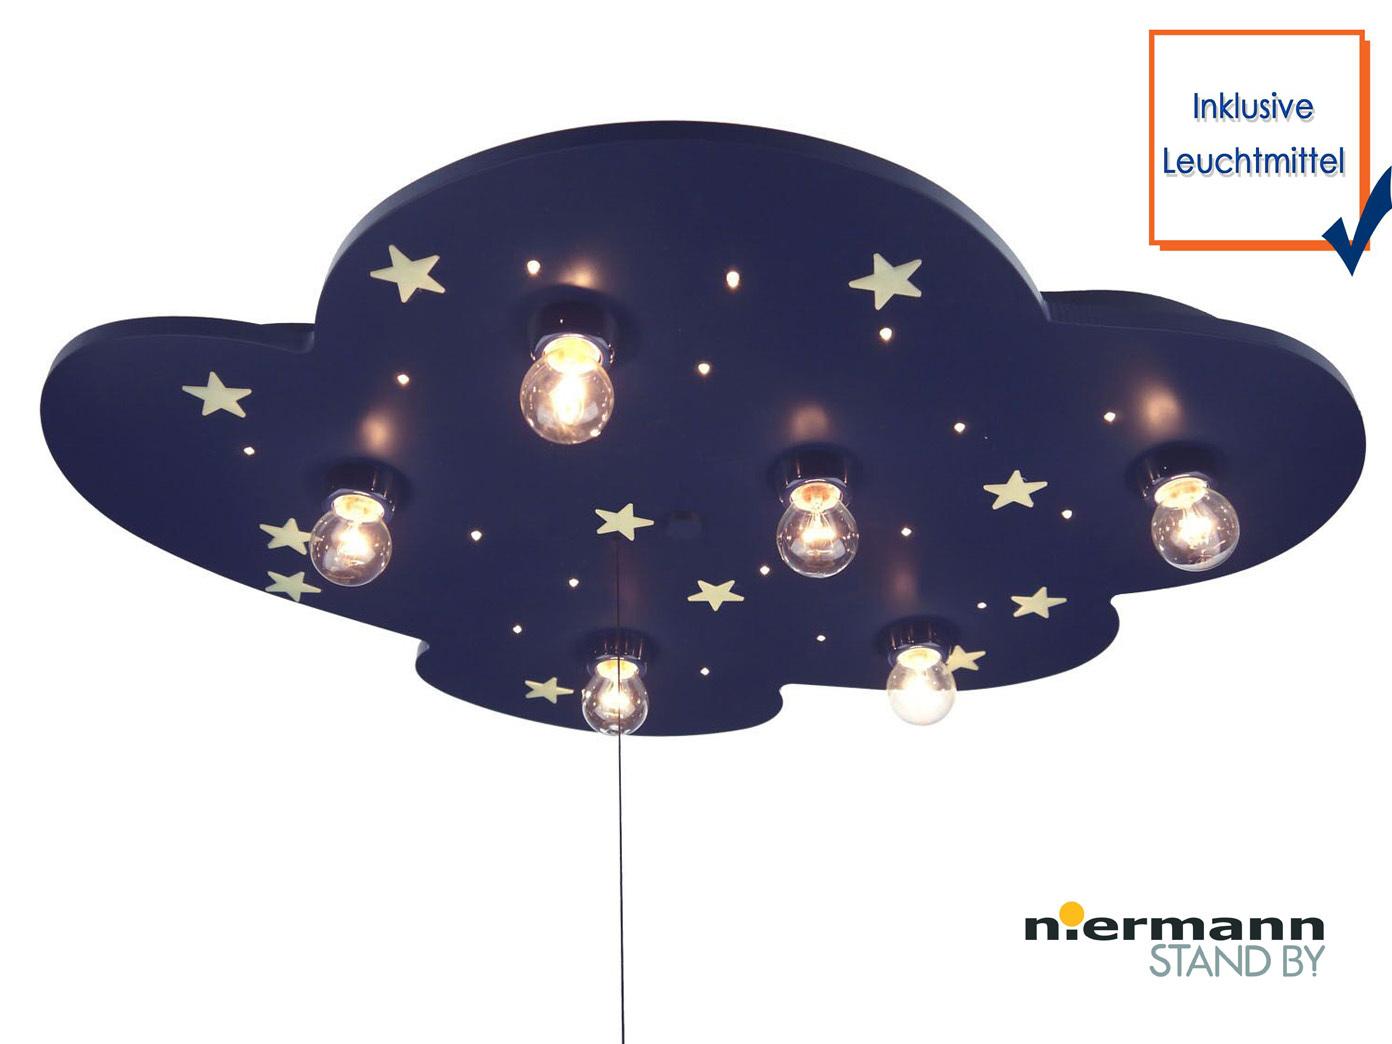 Led Deckenleuchte Kinderzimmer Alexa Schalte Licht An Led Sternenhimmel Neu